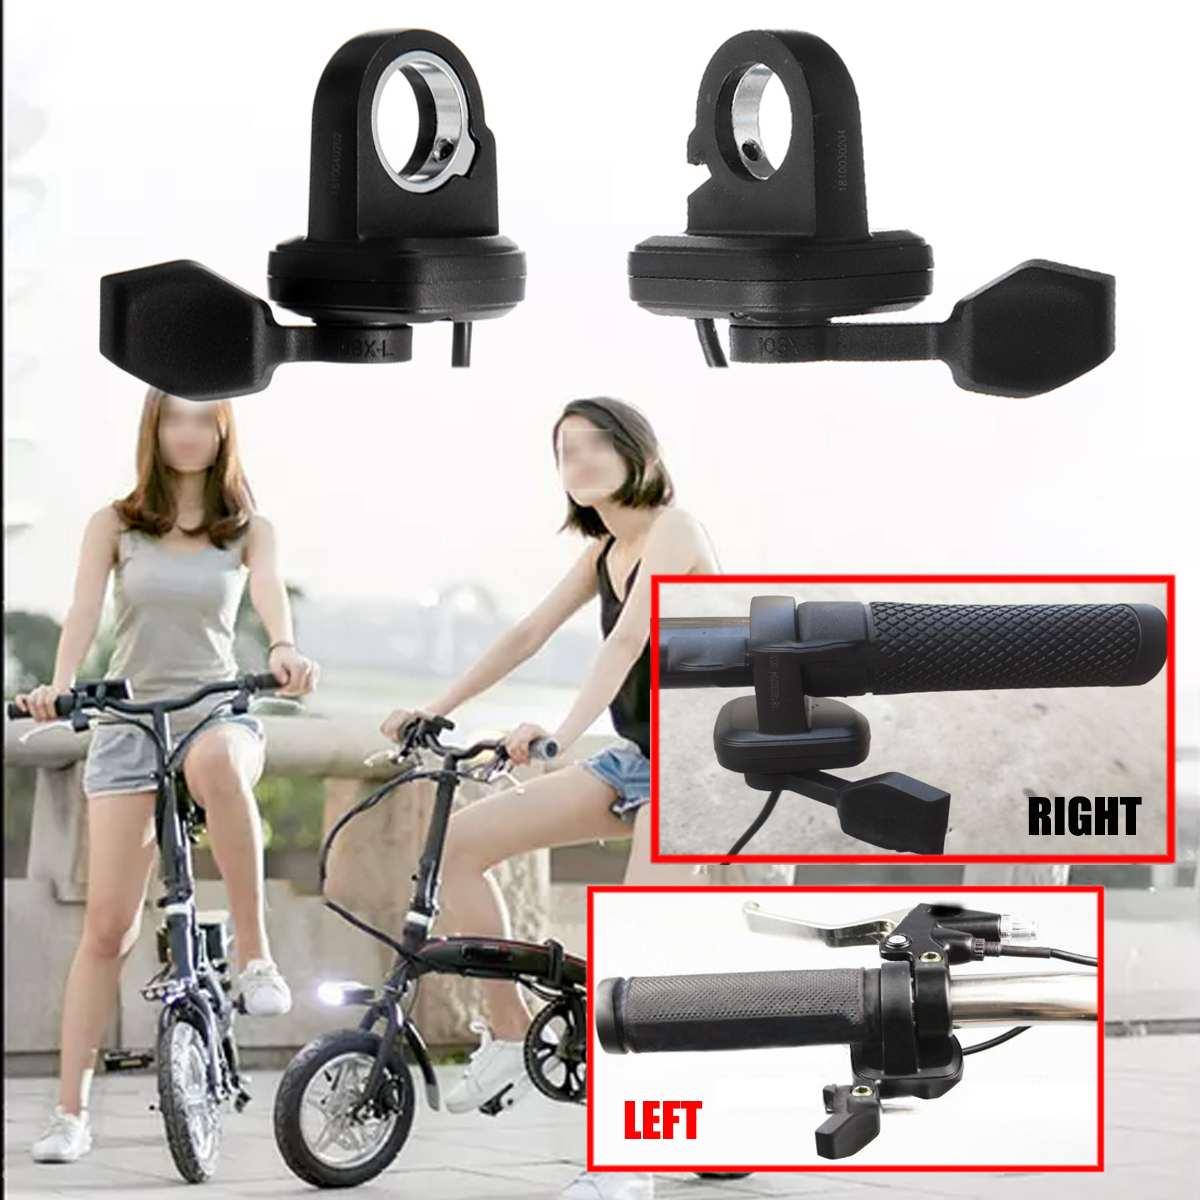 E-fahrrad Daumen-drossel Kunststoff Finger Daumen-drossel 24-72 v Elektrische Fahrrad Ebike Roller Links Rechts Daumen finger Trigger Drossel